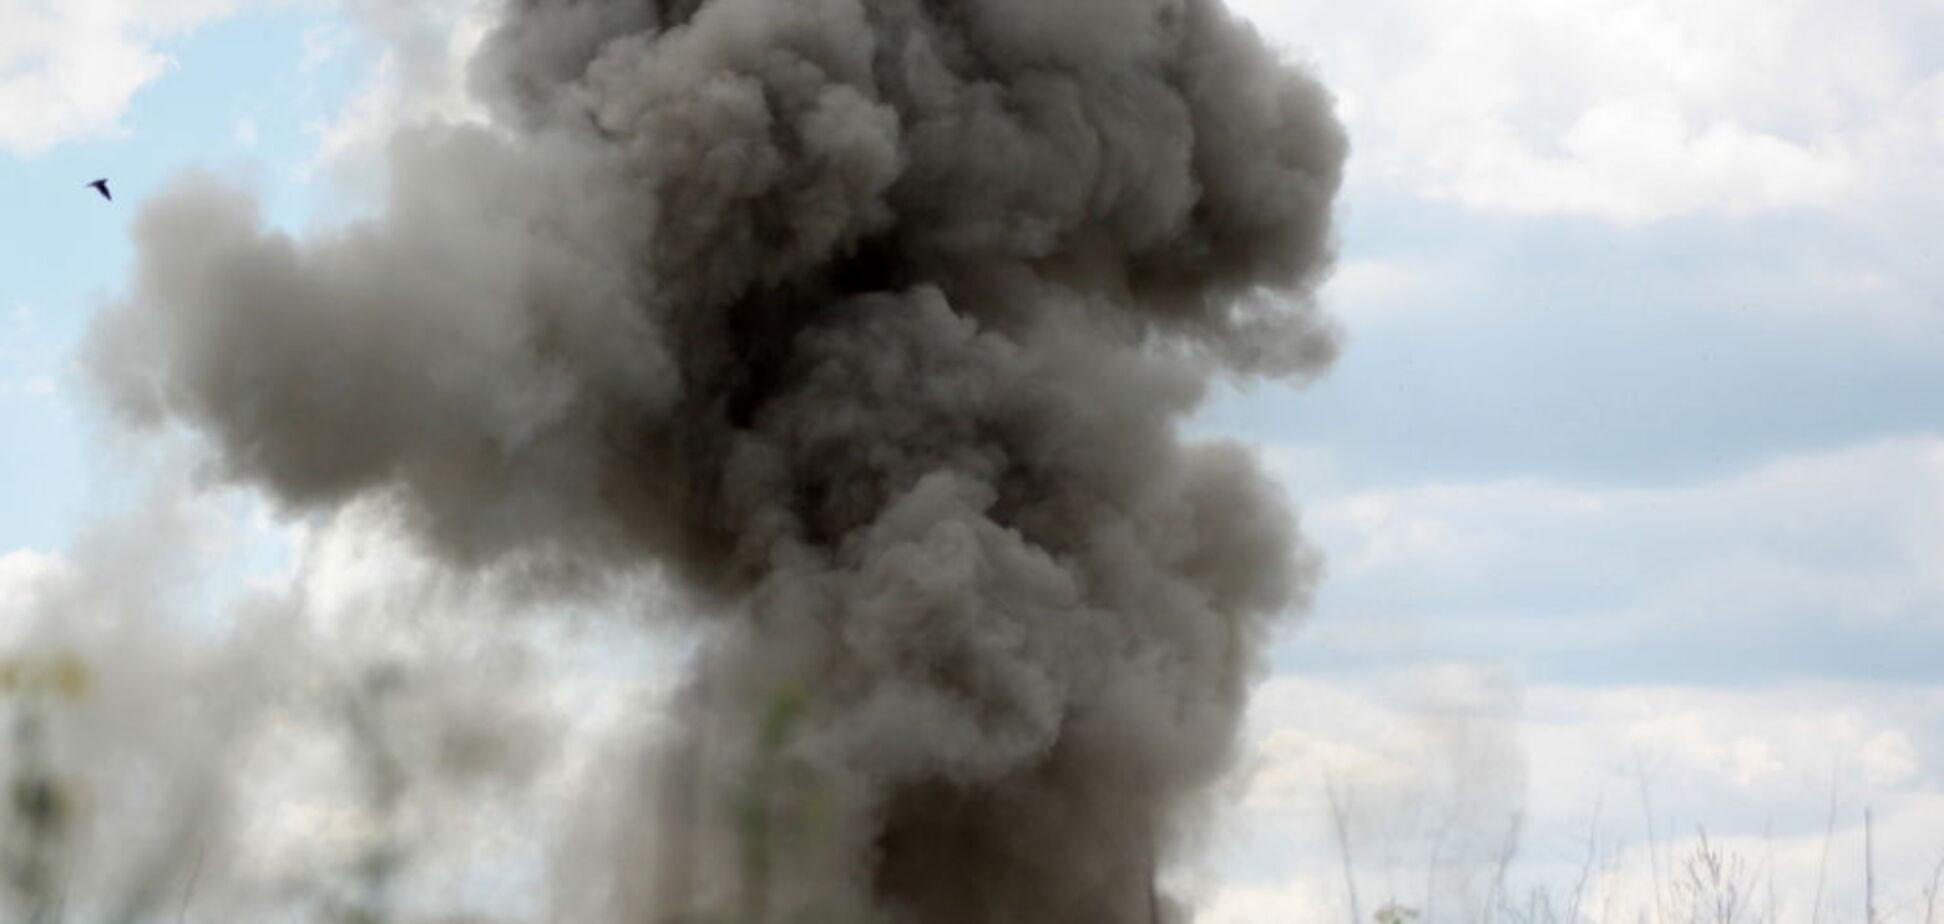 'ДНР' раптово вдарила з 'Градів' по ВСУ: Україна зазнала втрат